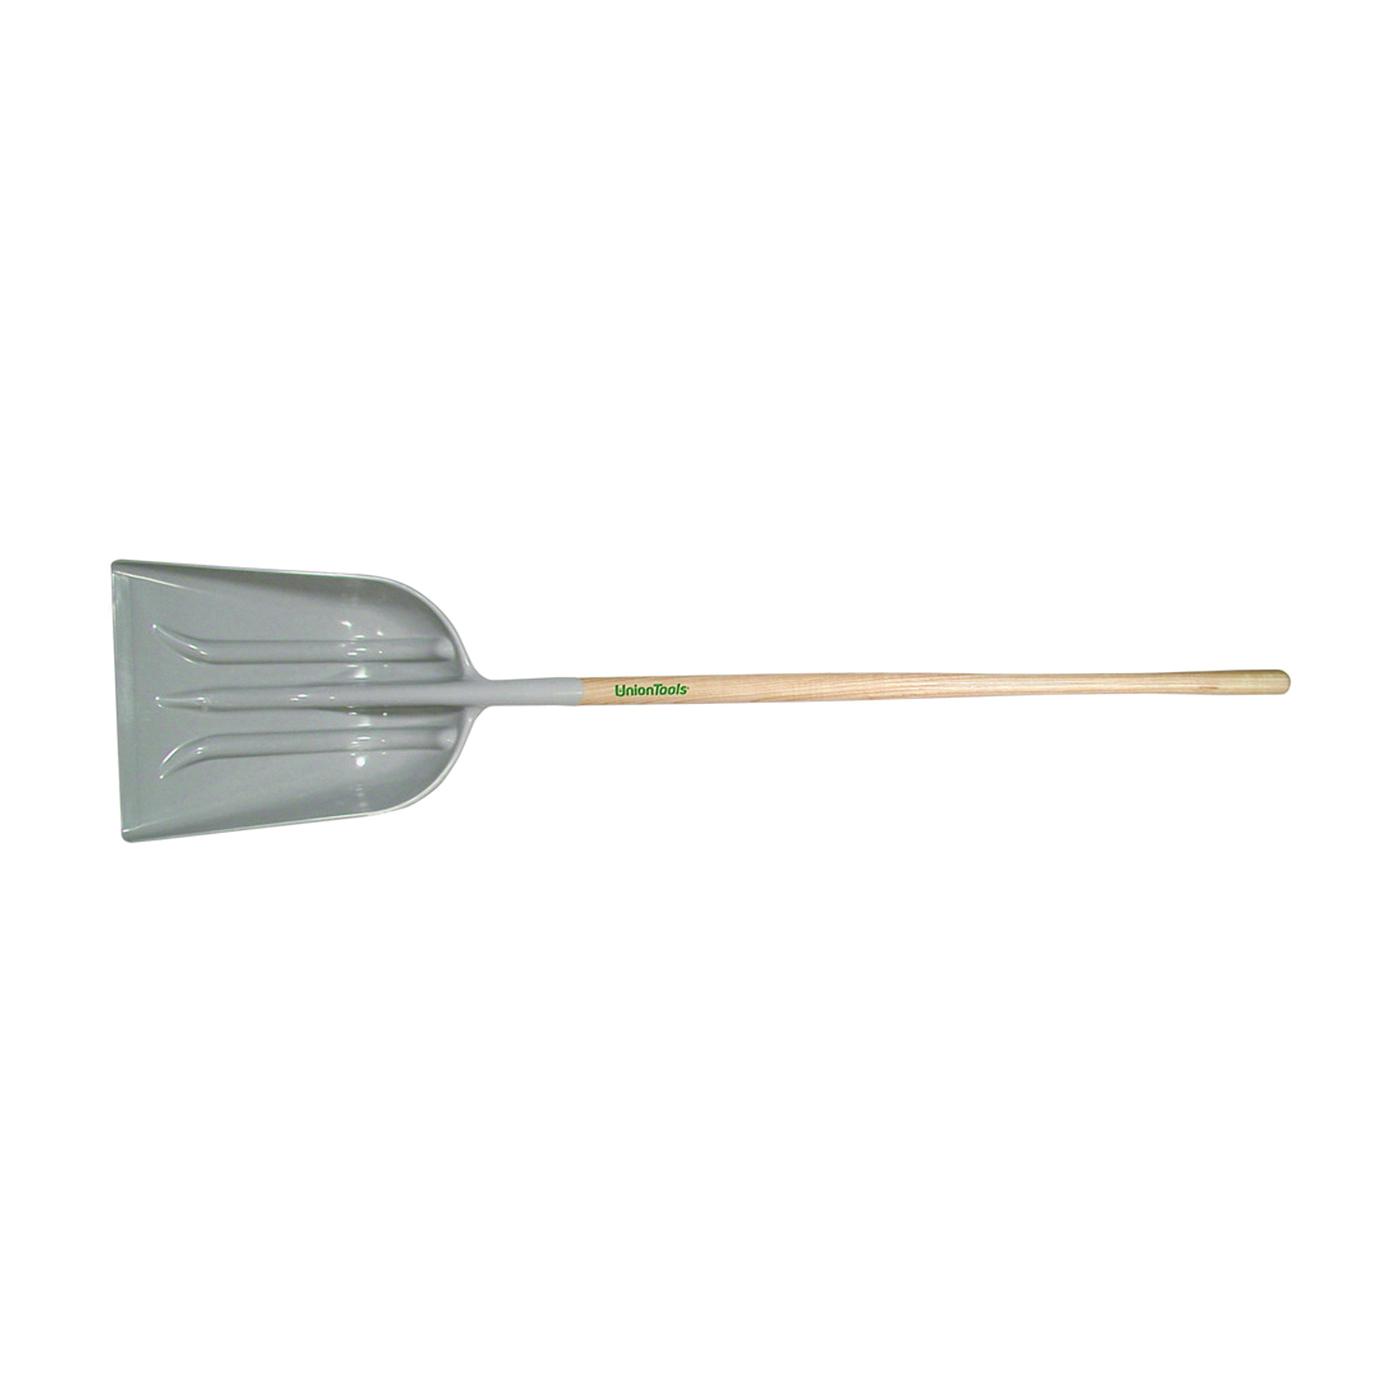 Picture of TRUE TEMPER 1680100 Grain Scoop, 14-3/4 in W Blade, 18-3/4 in L Blade, Poly Blade, Hardwood Handle, 64 in OAL